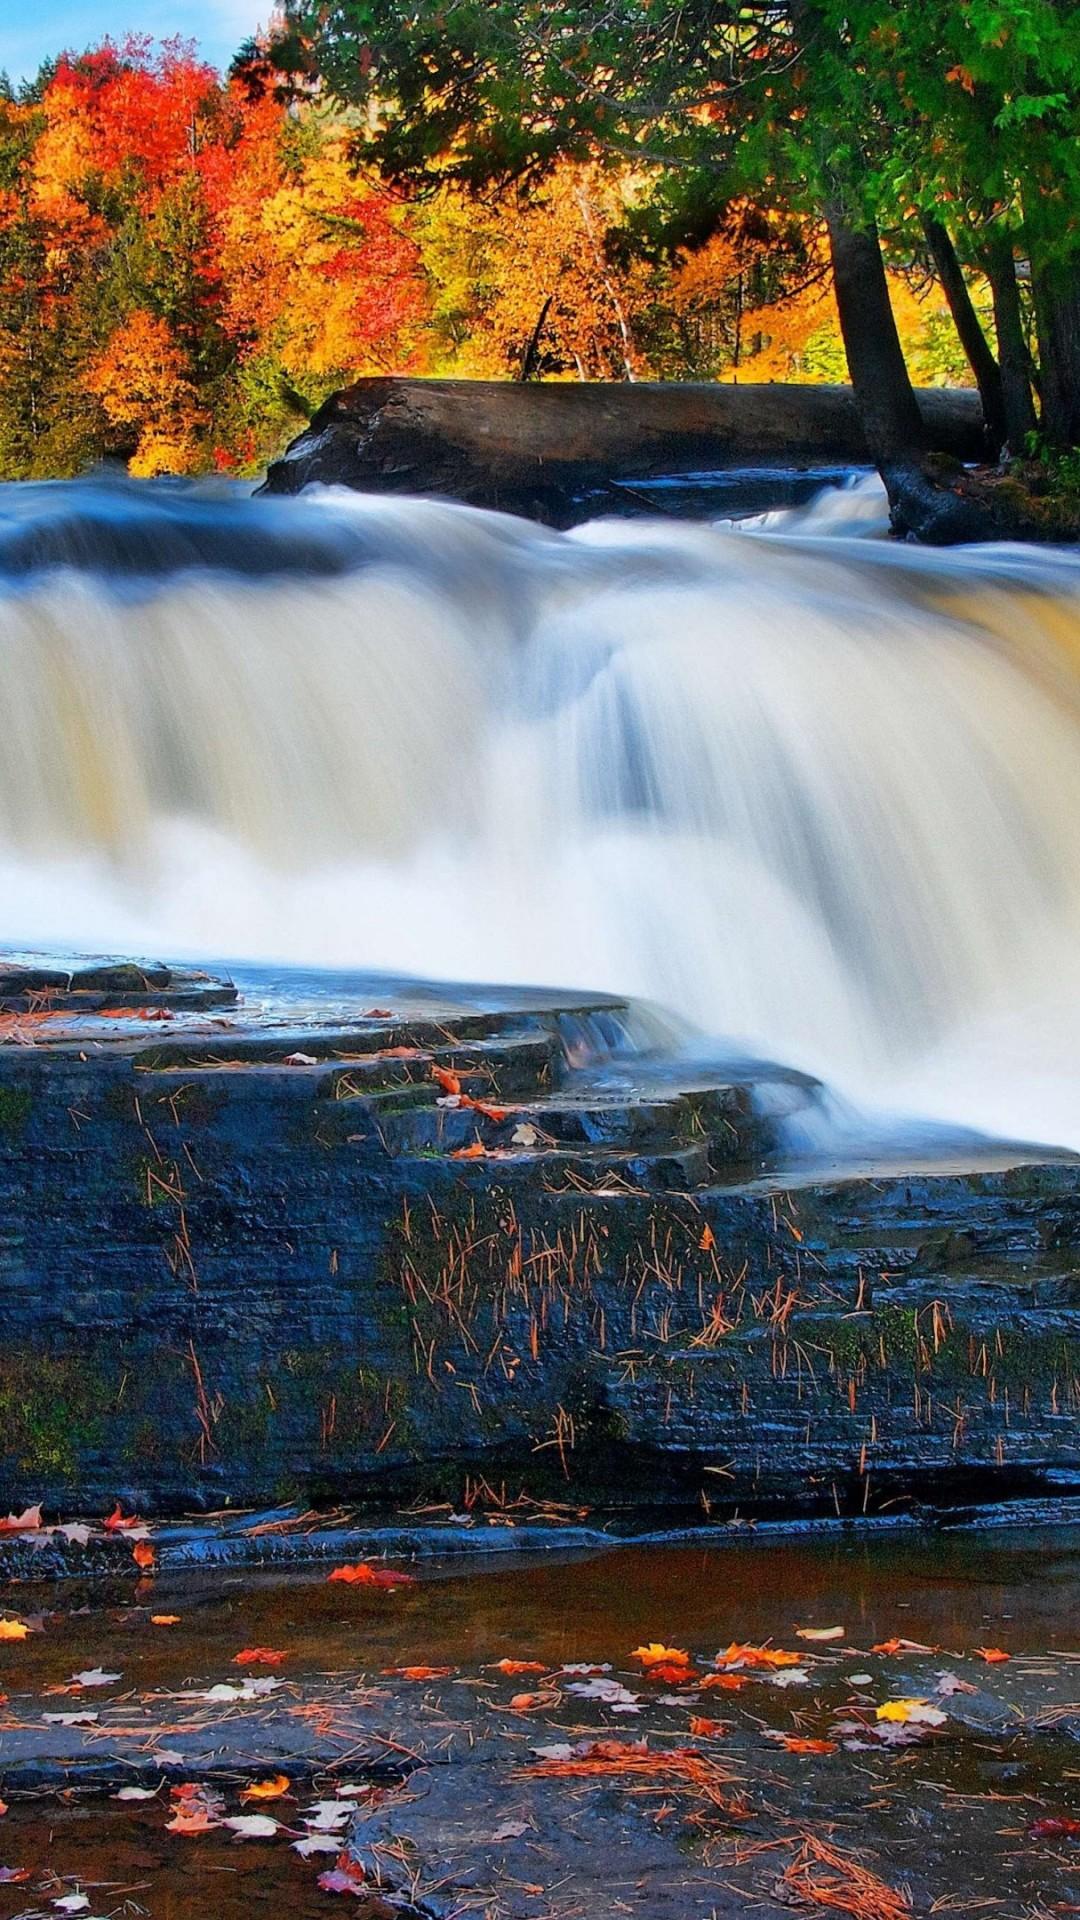 Wallpaper Wallpaper Quotes Wallpaper Forest 5k 4k Wallpaper River Waterfall